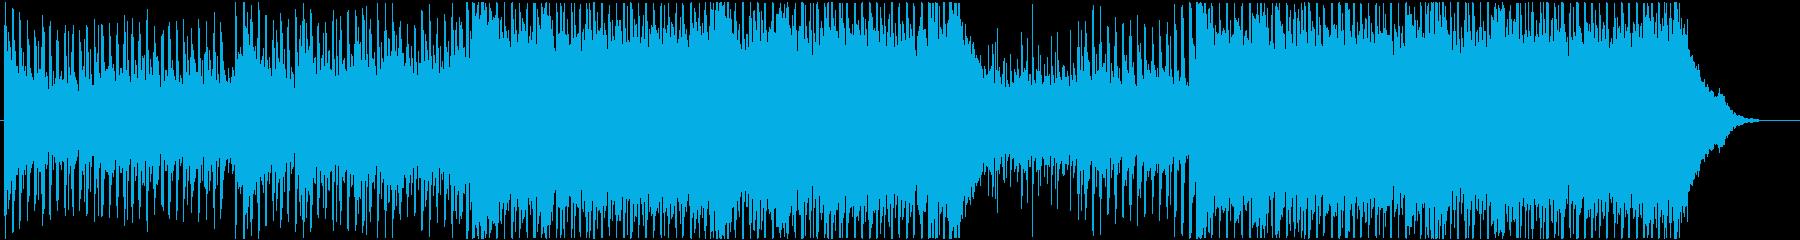 Refreshing guitar pop EDM's reproduced waveform